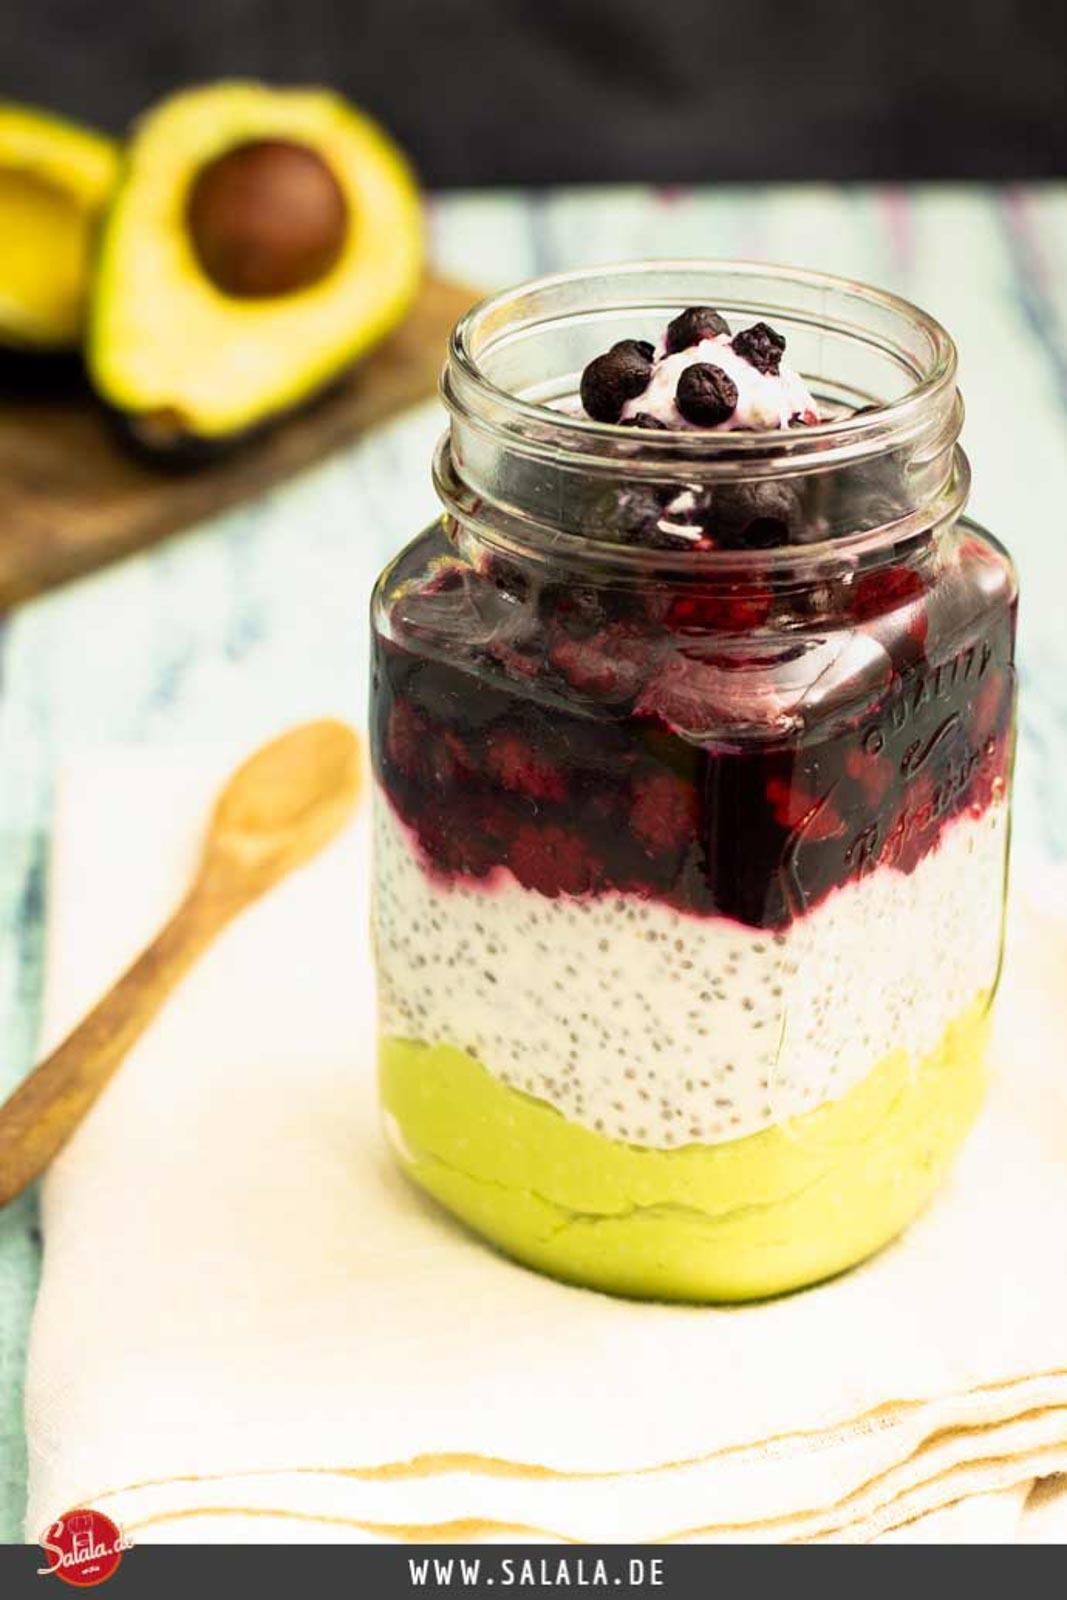 Avocado-Chia-Beeren-Joghurt zum Frühstück I by salala.de I Low Carb Rezept als Nachspeise